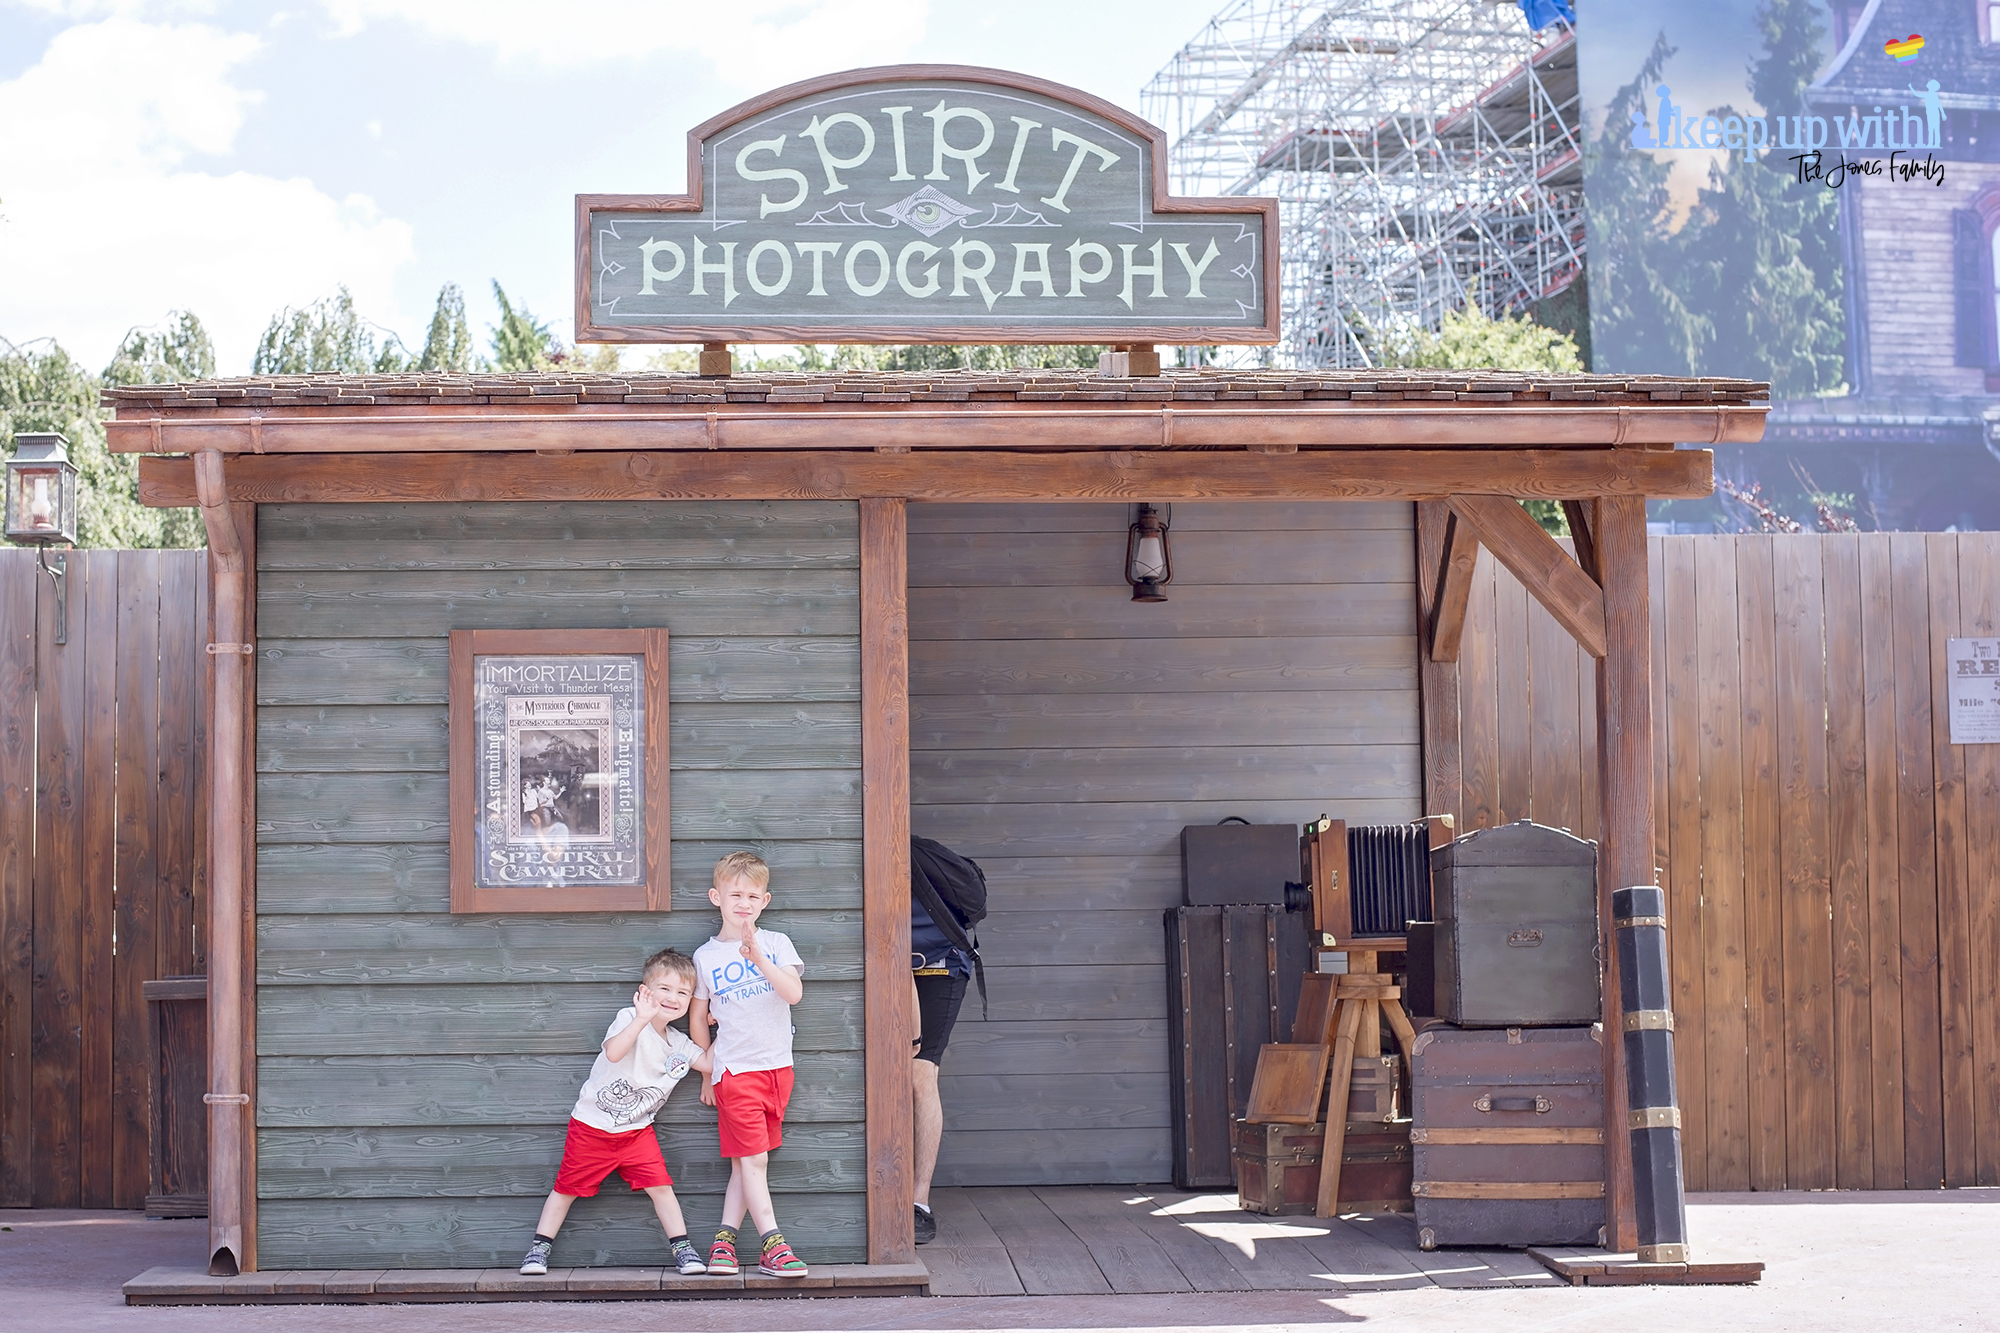 Spirit Photography at Disneyland Paris